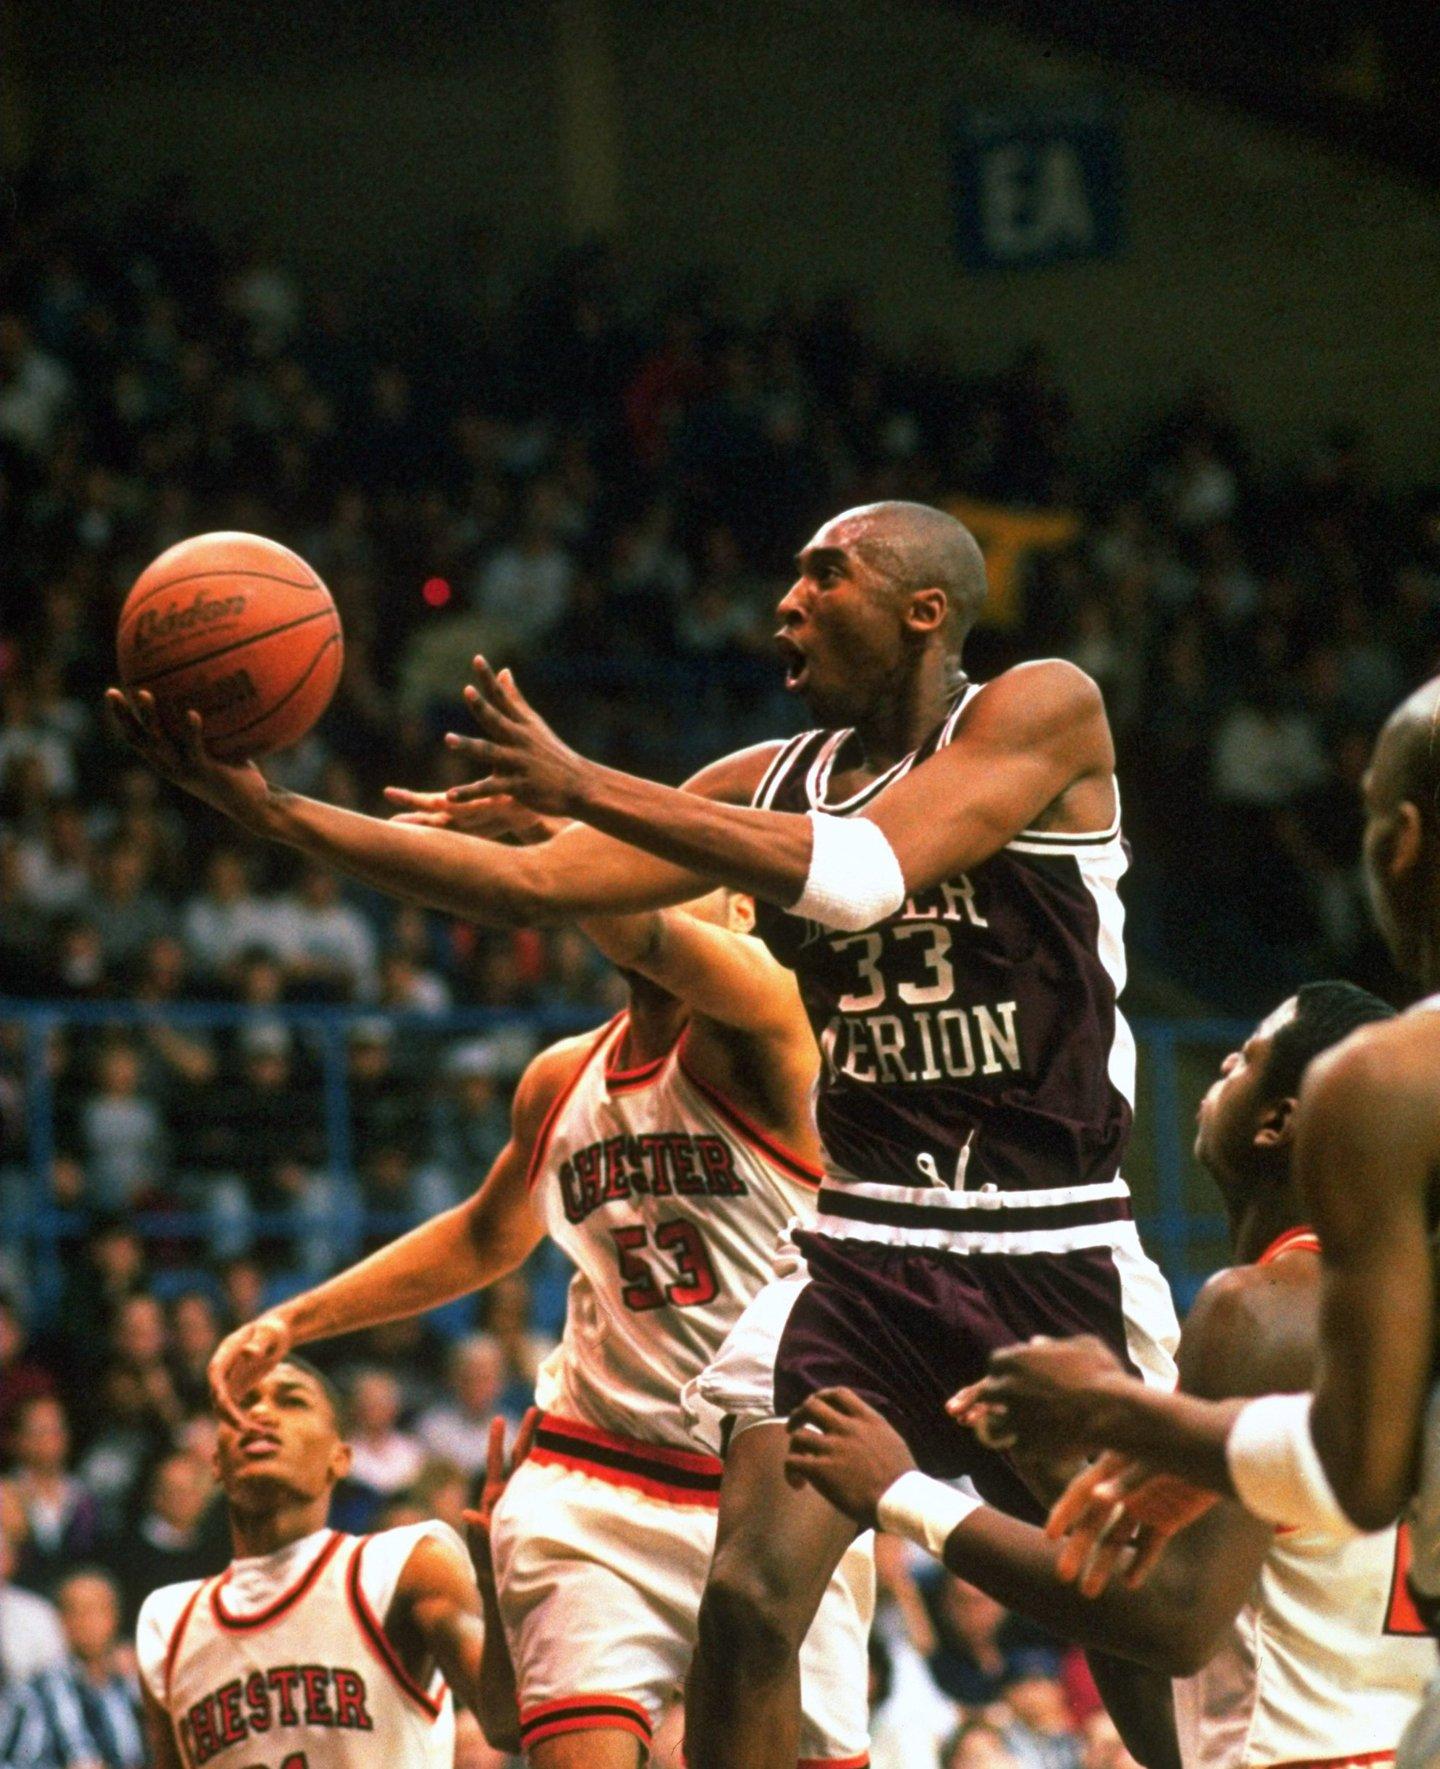 RT @mashable: Kobe Bryant's high school teammates remember the early days of the legend https://t.co/oTLA01MuTN https://t.co/LlJGIHeOqh